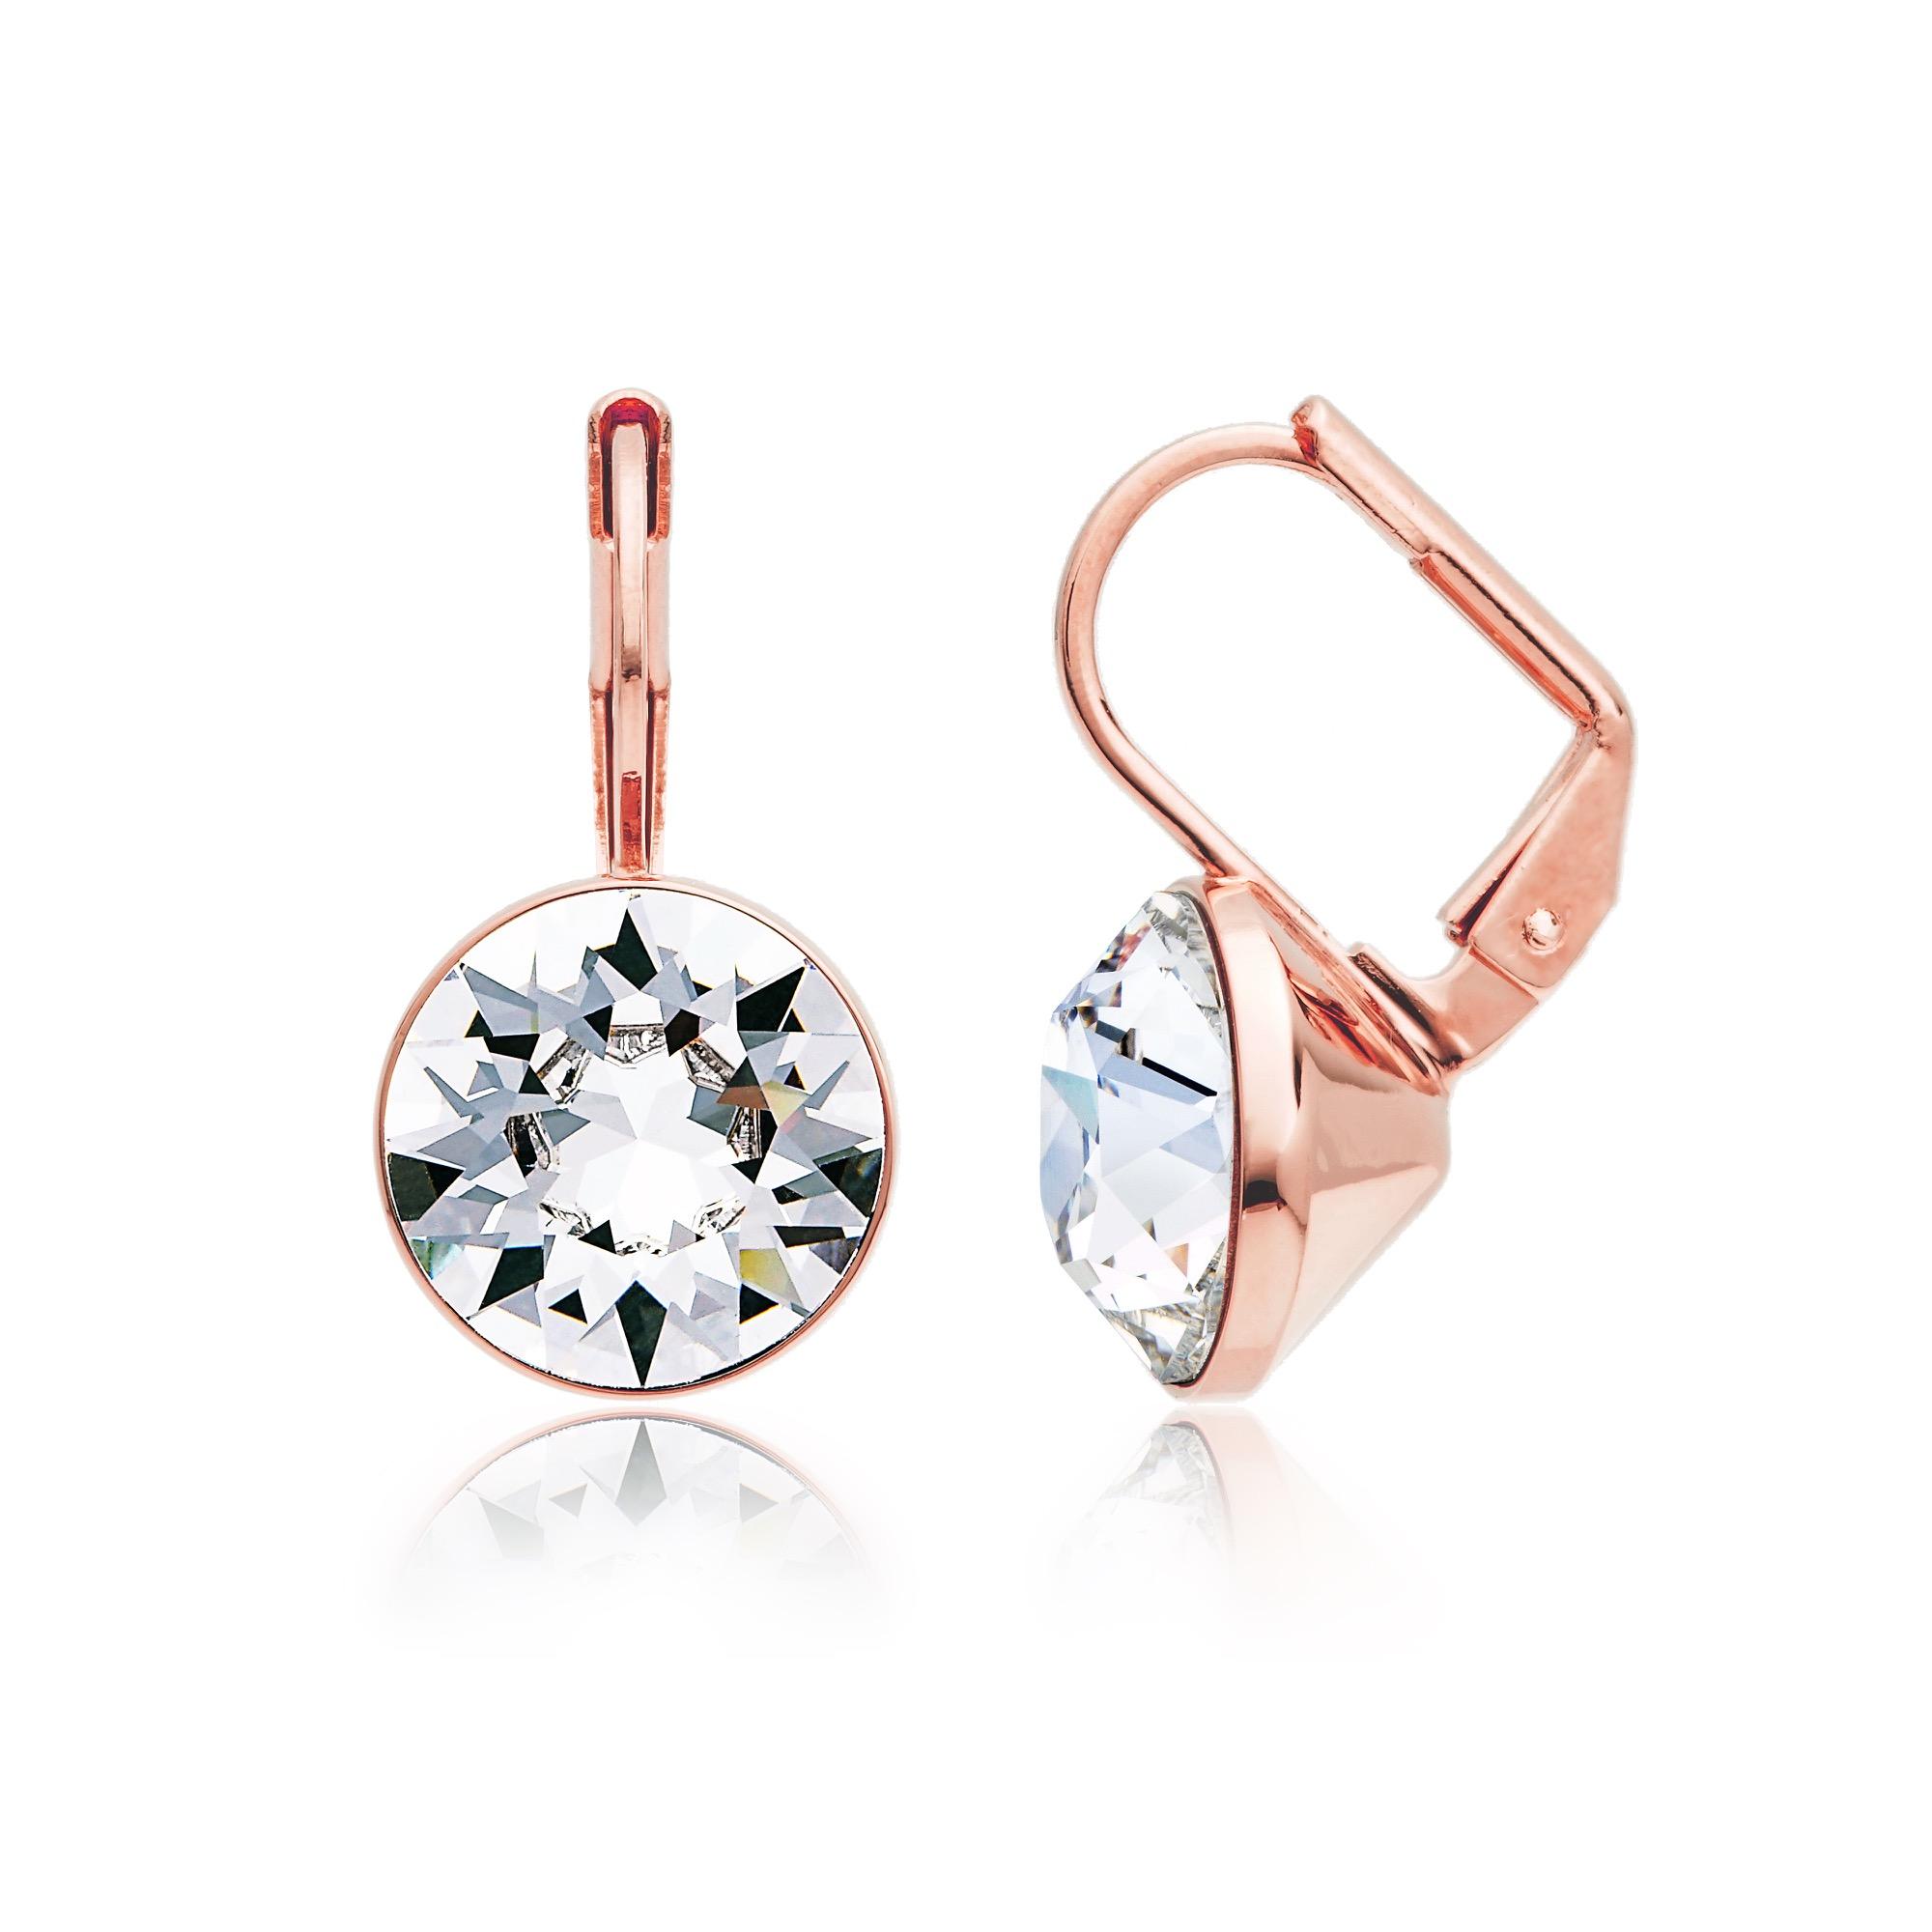 MYJS Bella Statement Earrings Clear Swarovski Crystal Rhodium Plated pieTm